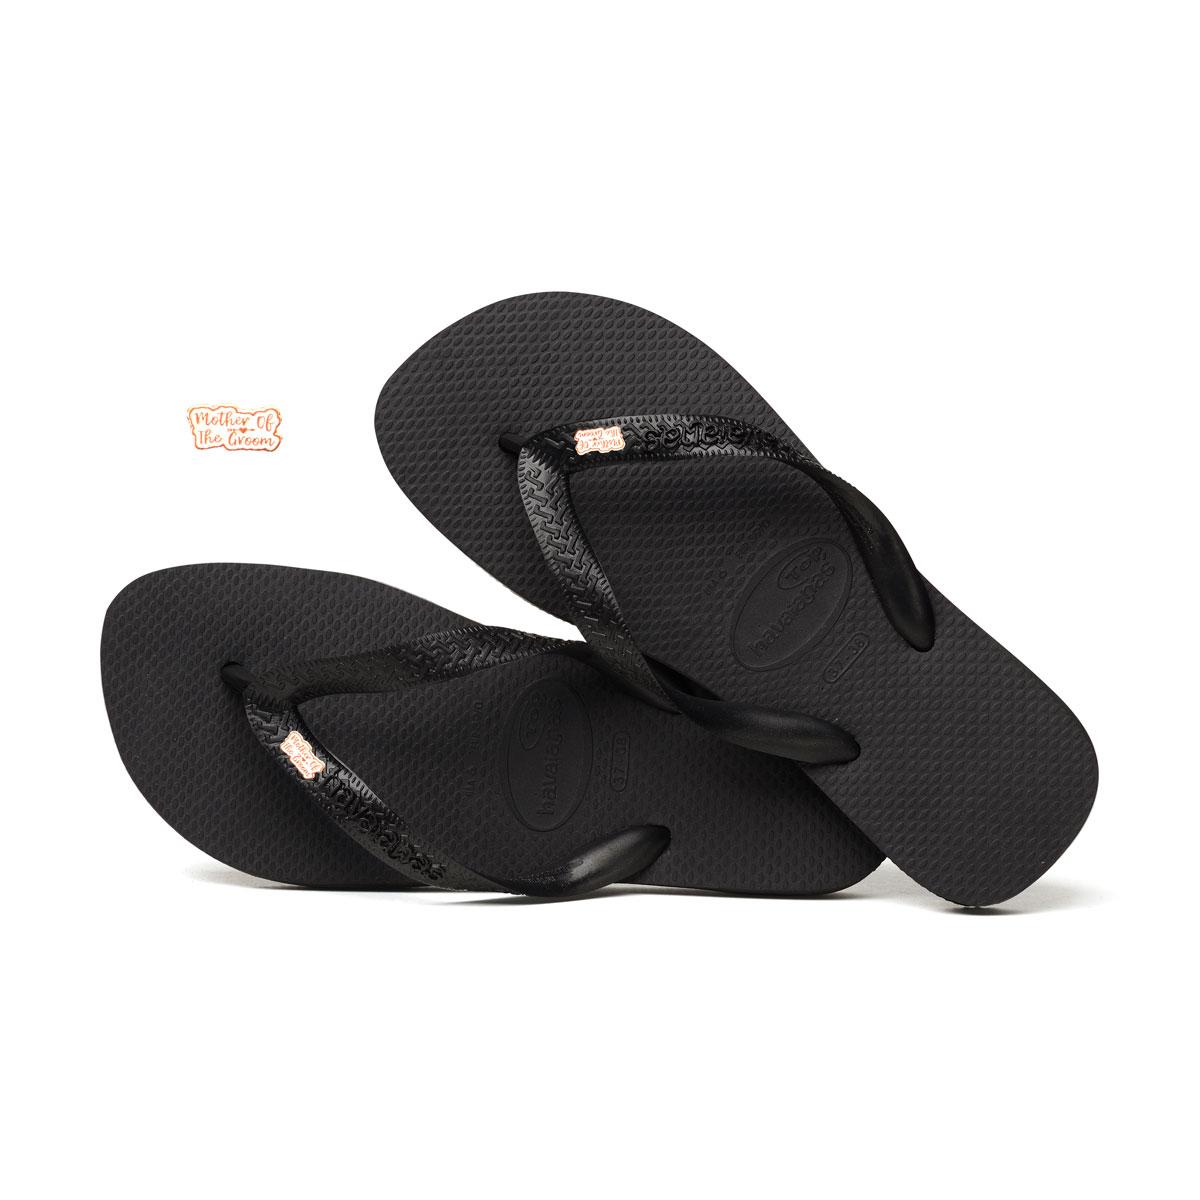 Rose Gold Mother of the Groom Pin Havaianas Black Wedding Flip Flops